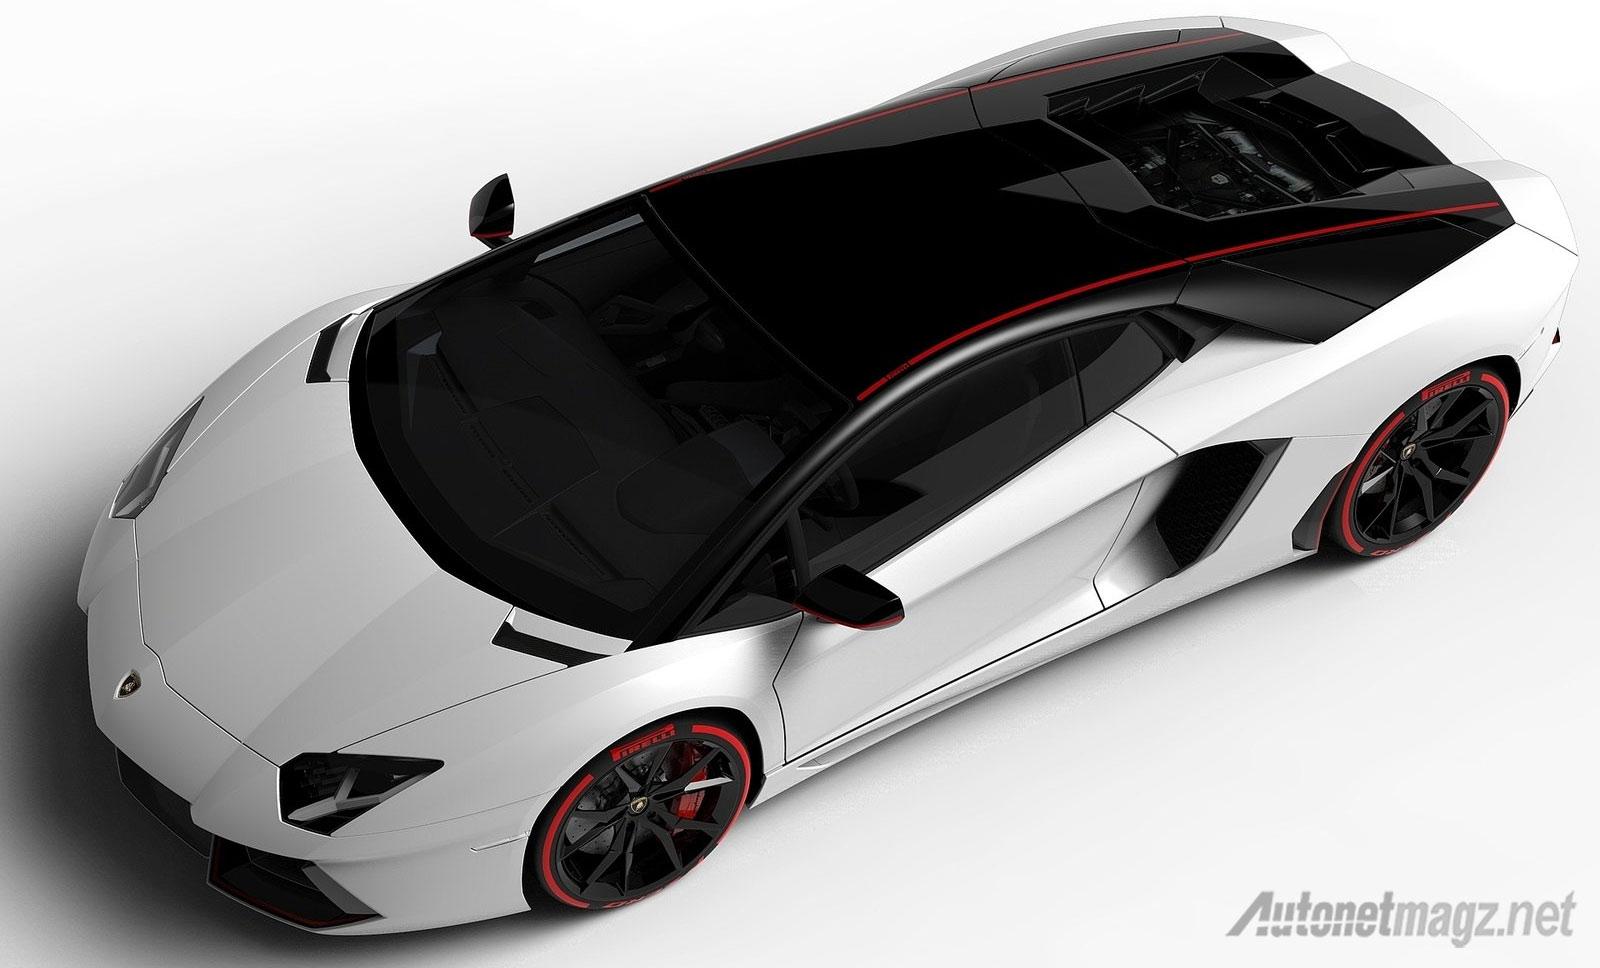 Wallpaper-Lamborghini-Aventador